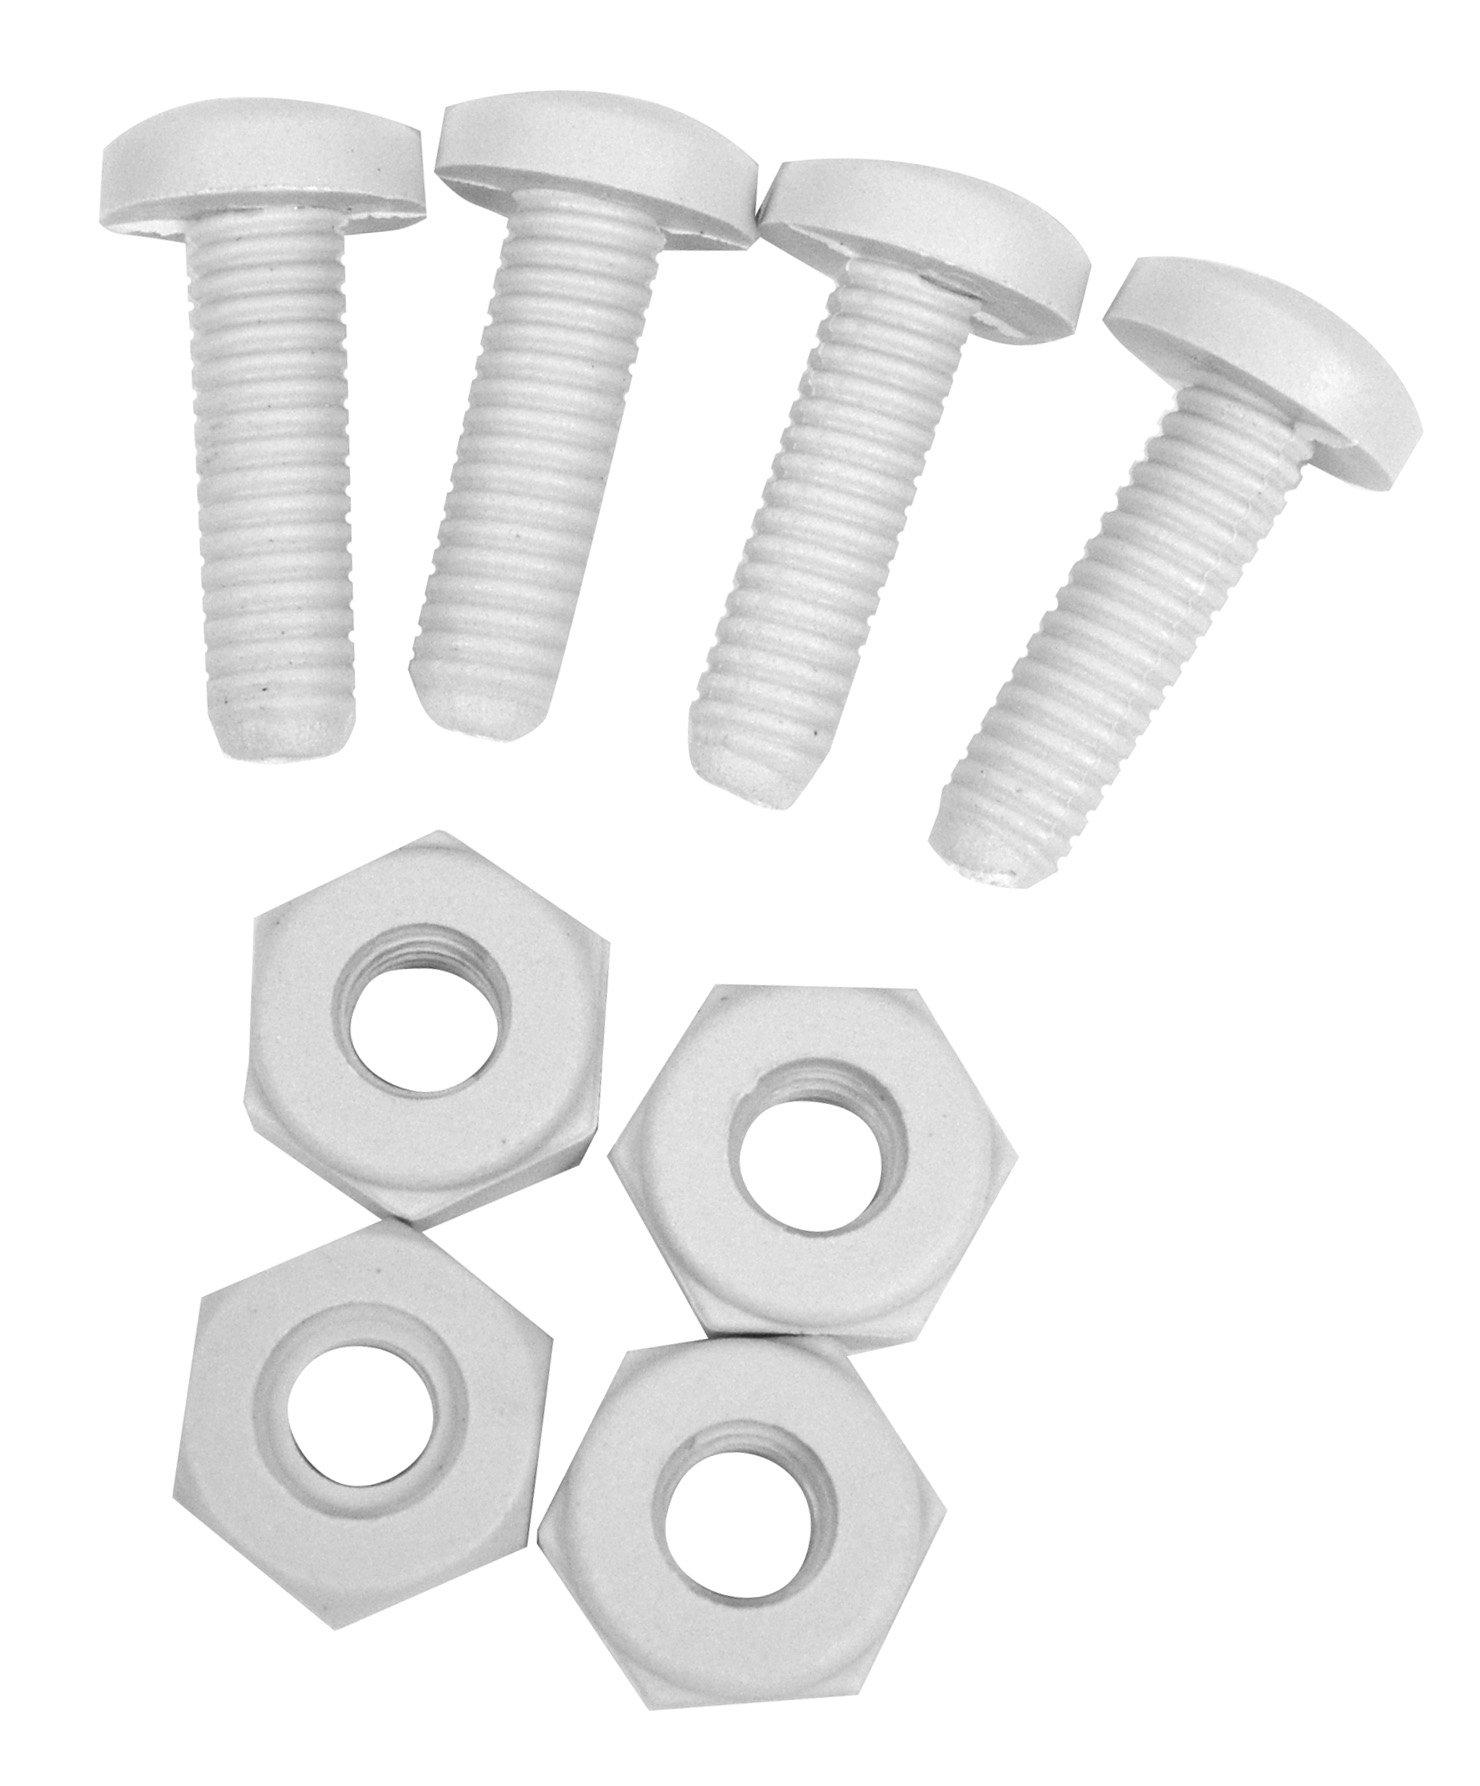 Custom Accessories 93332 White Nylon License Plate Fastener